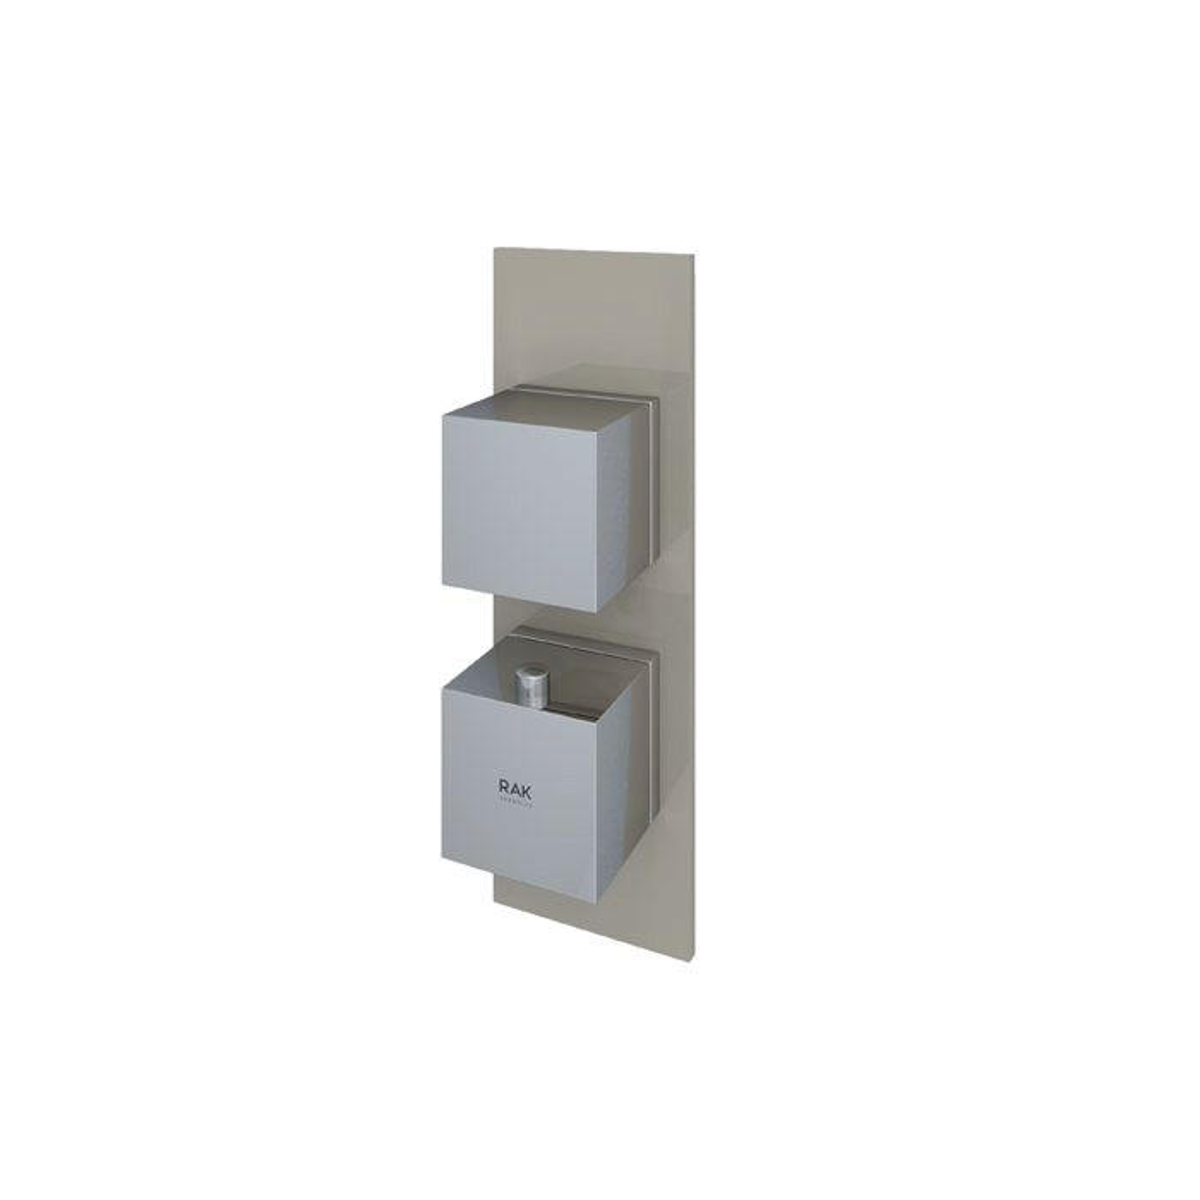 RAK Feeling Cappucino Square Single Outlet Thermostatic Shower Valve